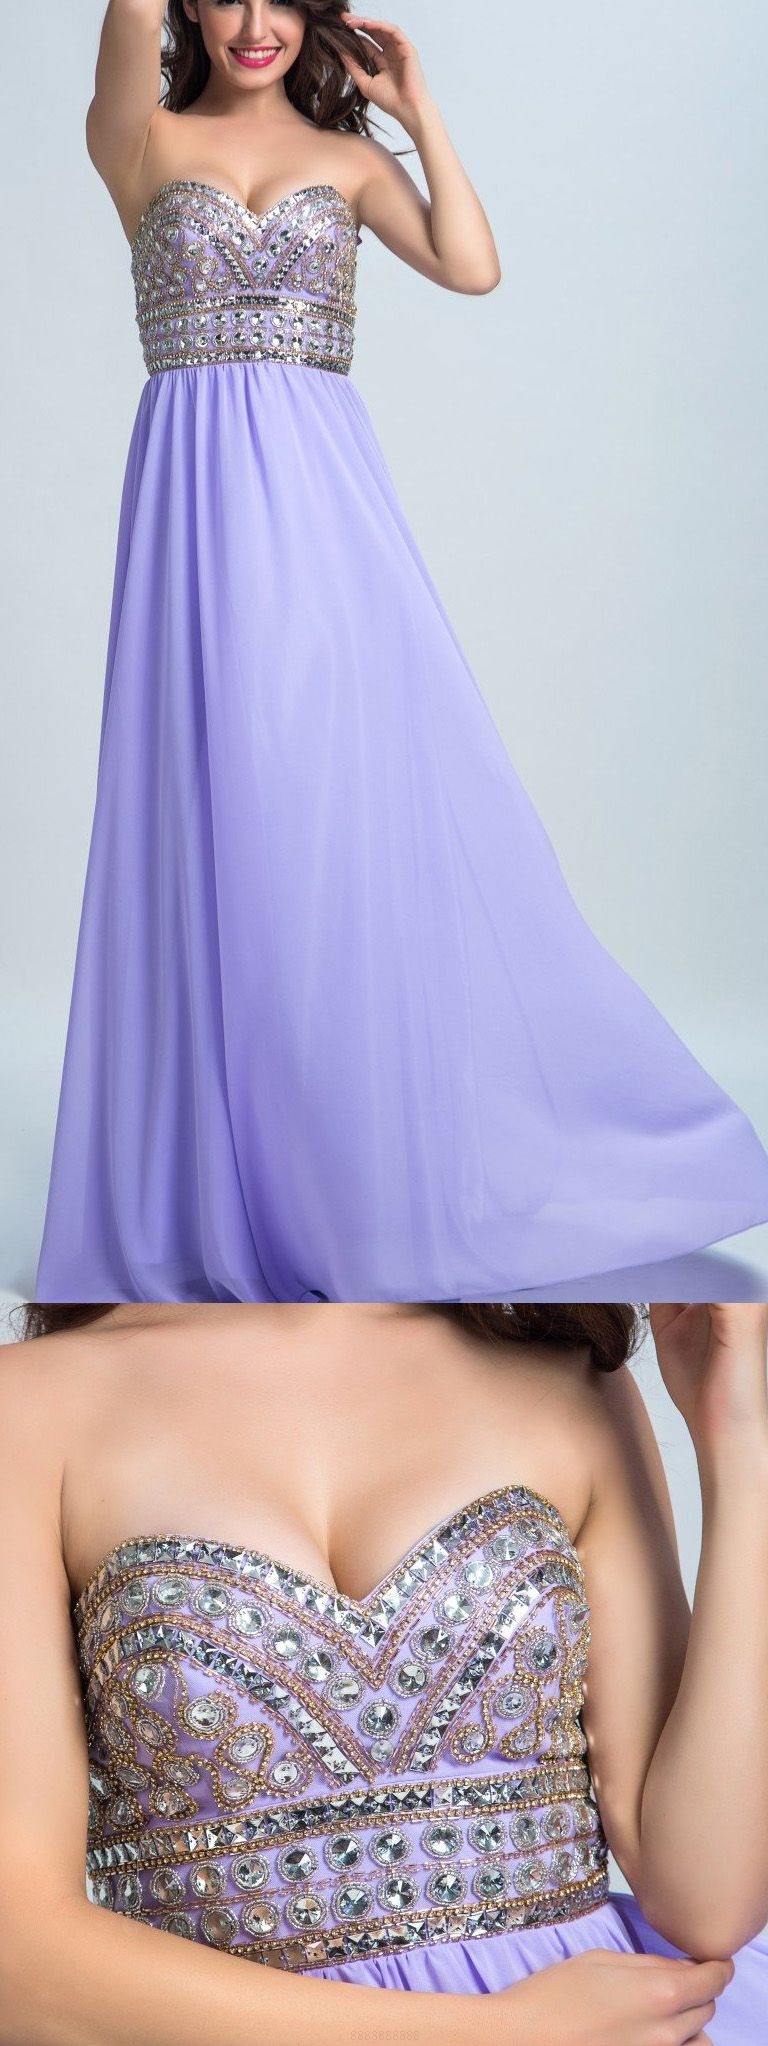 Lavender prom dresses long prom dresses long lavender evening